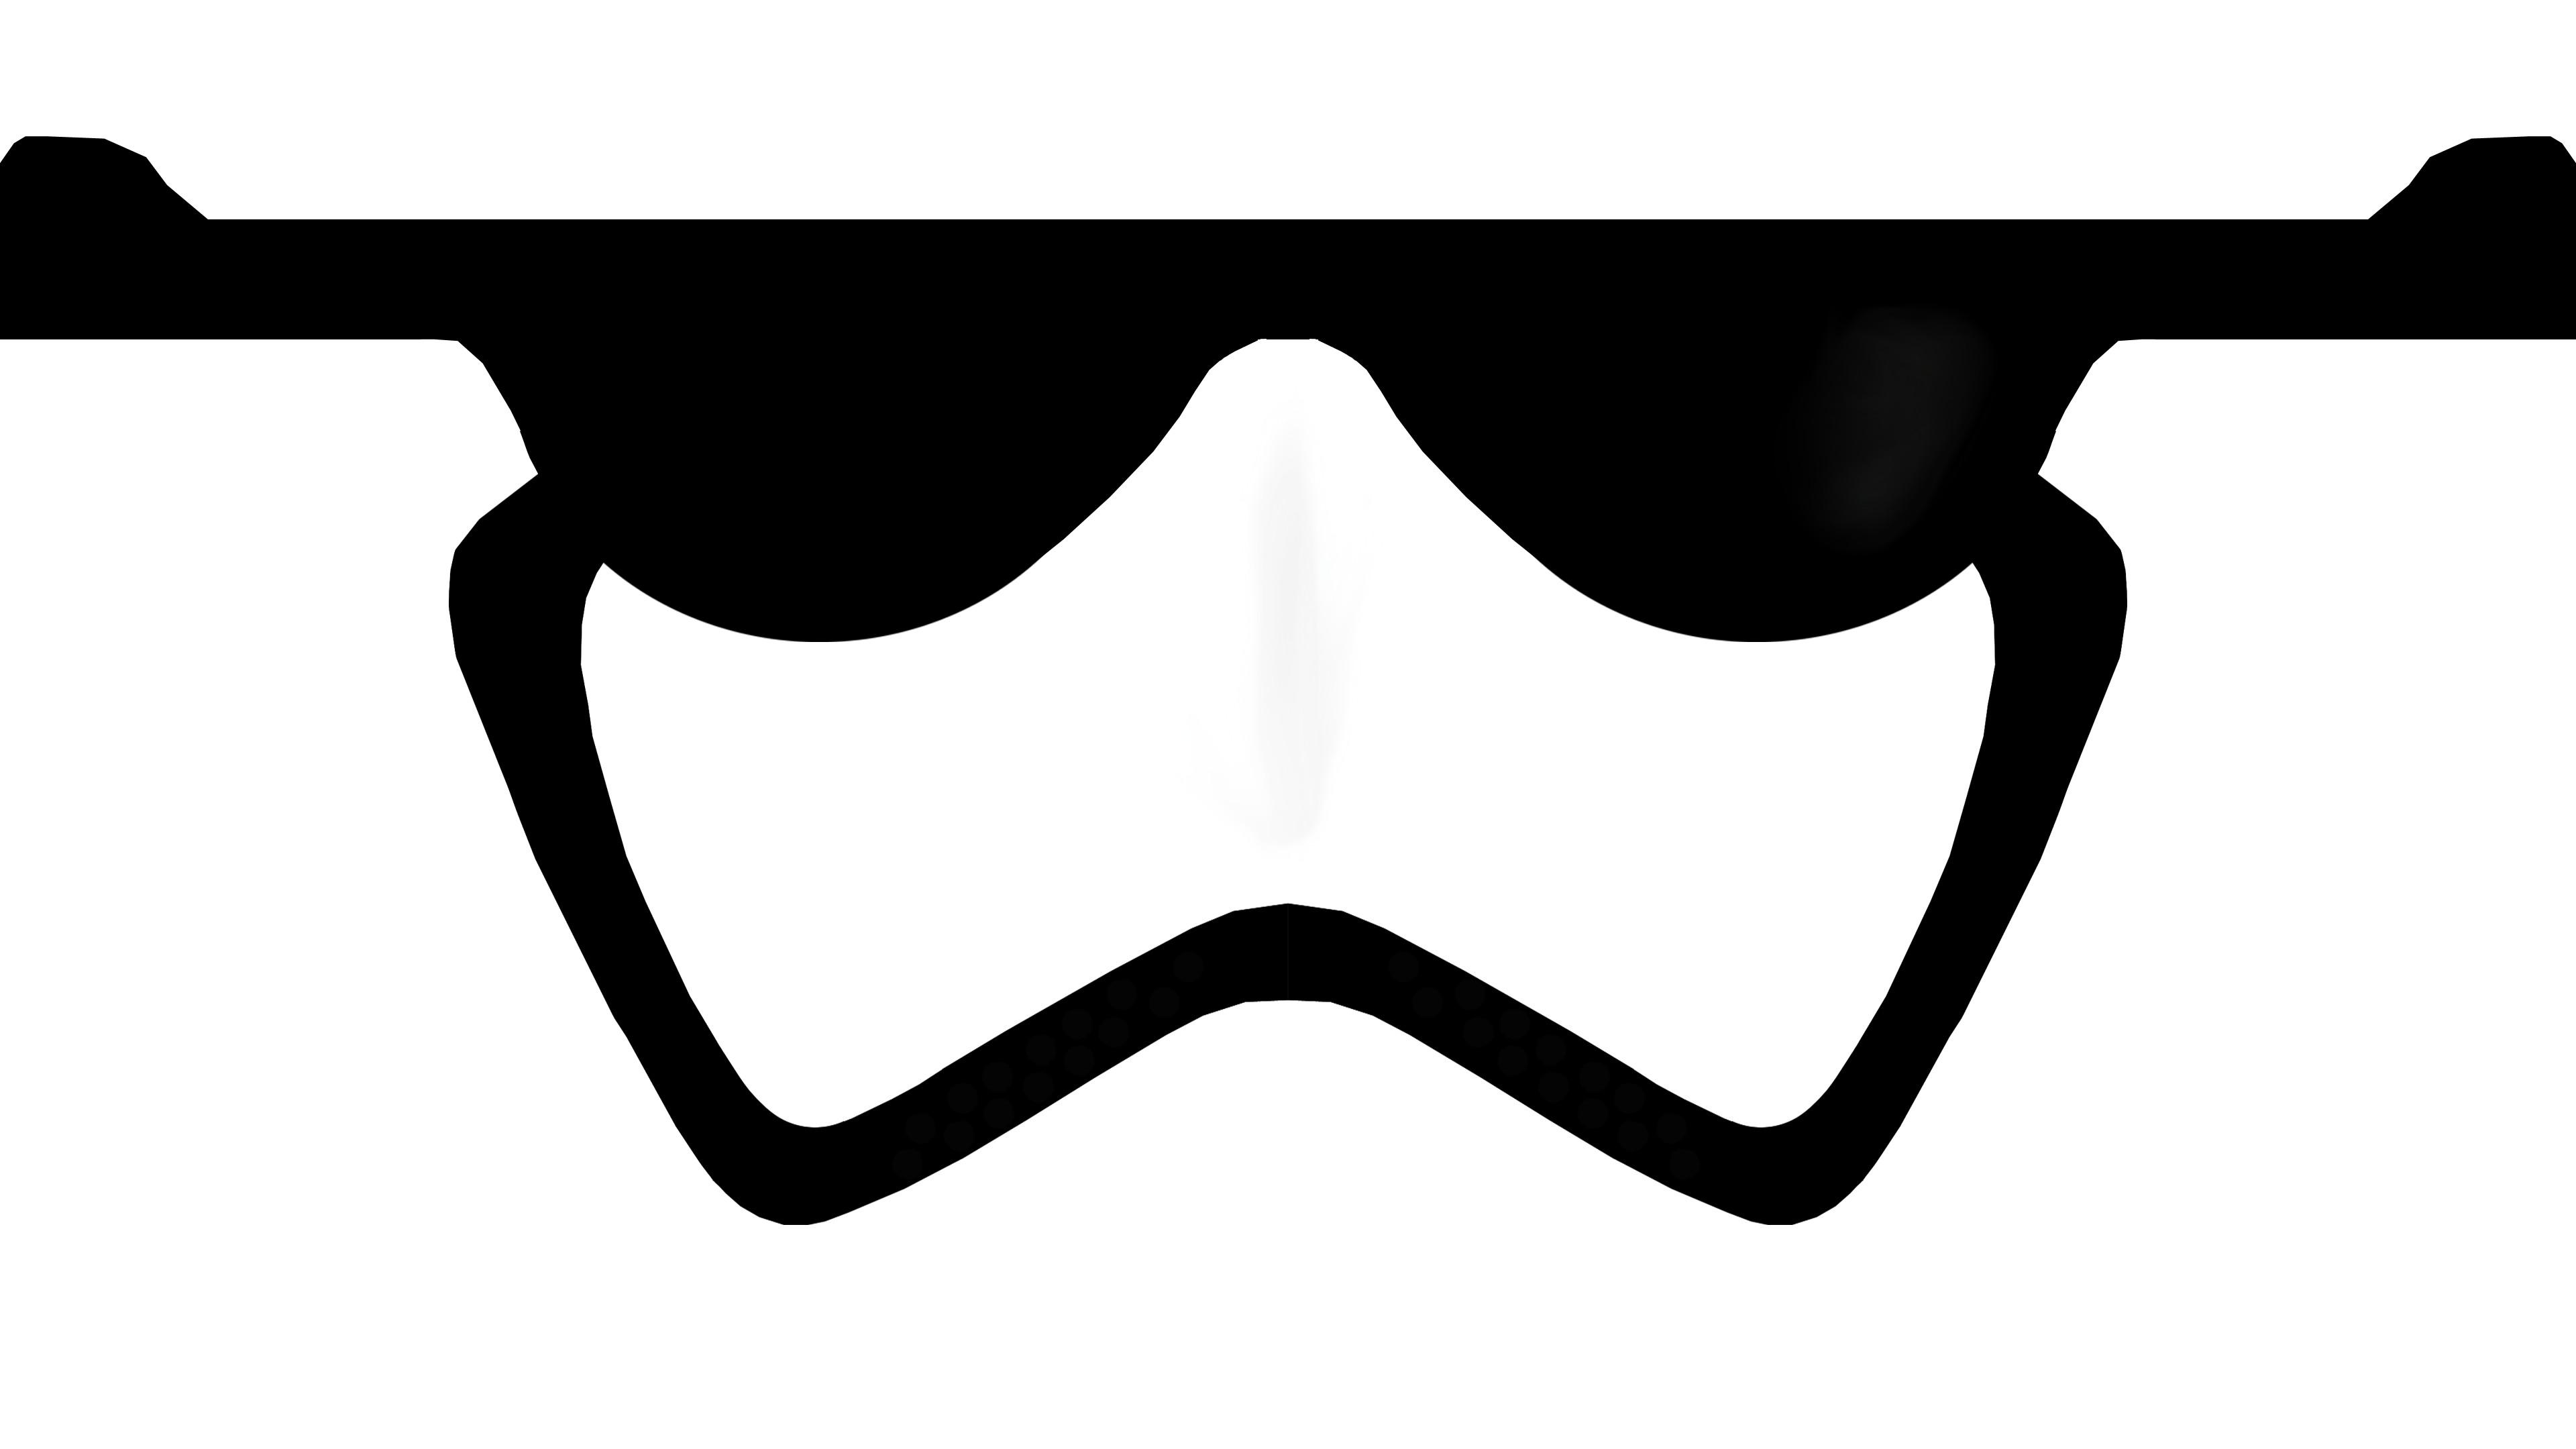 Star Wars – First Order Stormtrooper Wallpaper